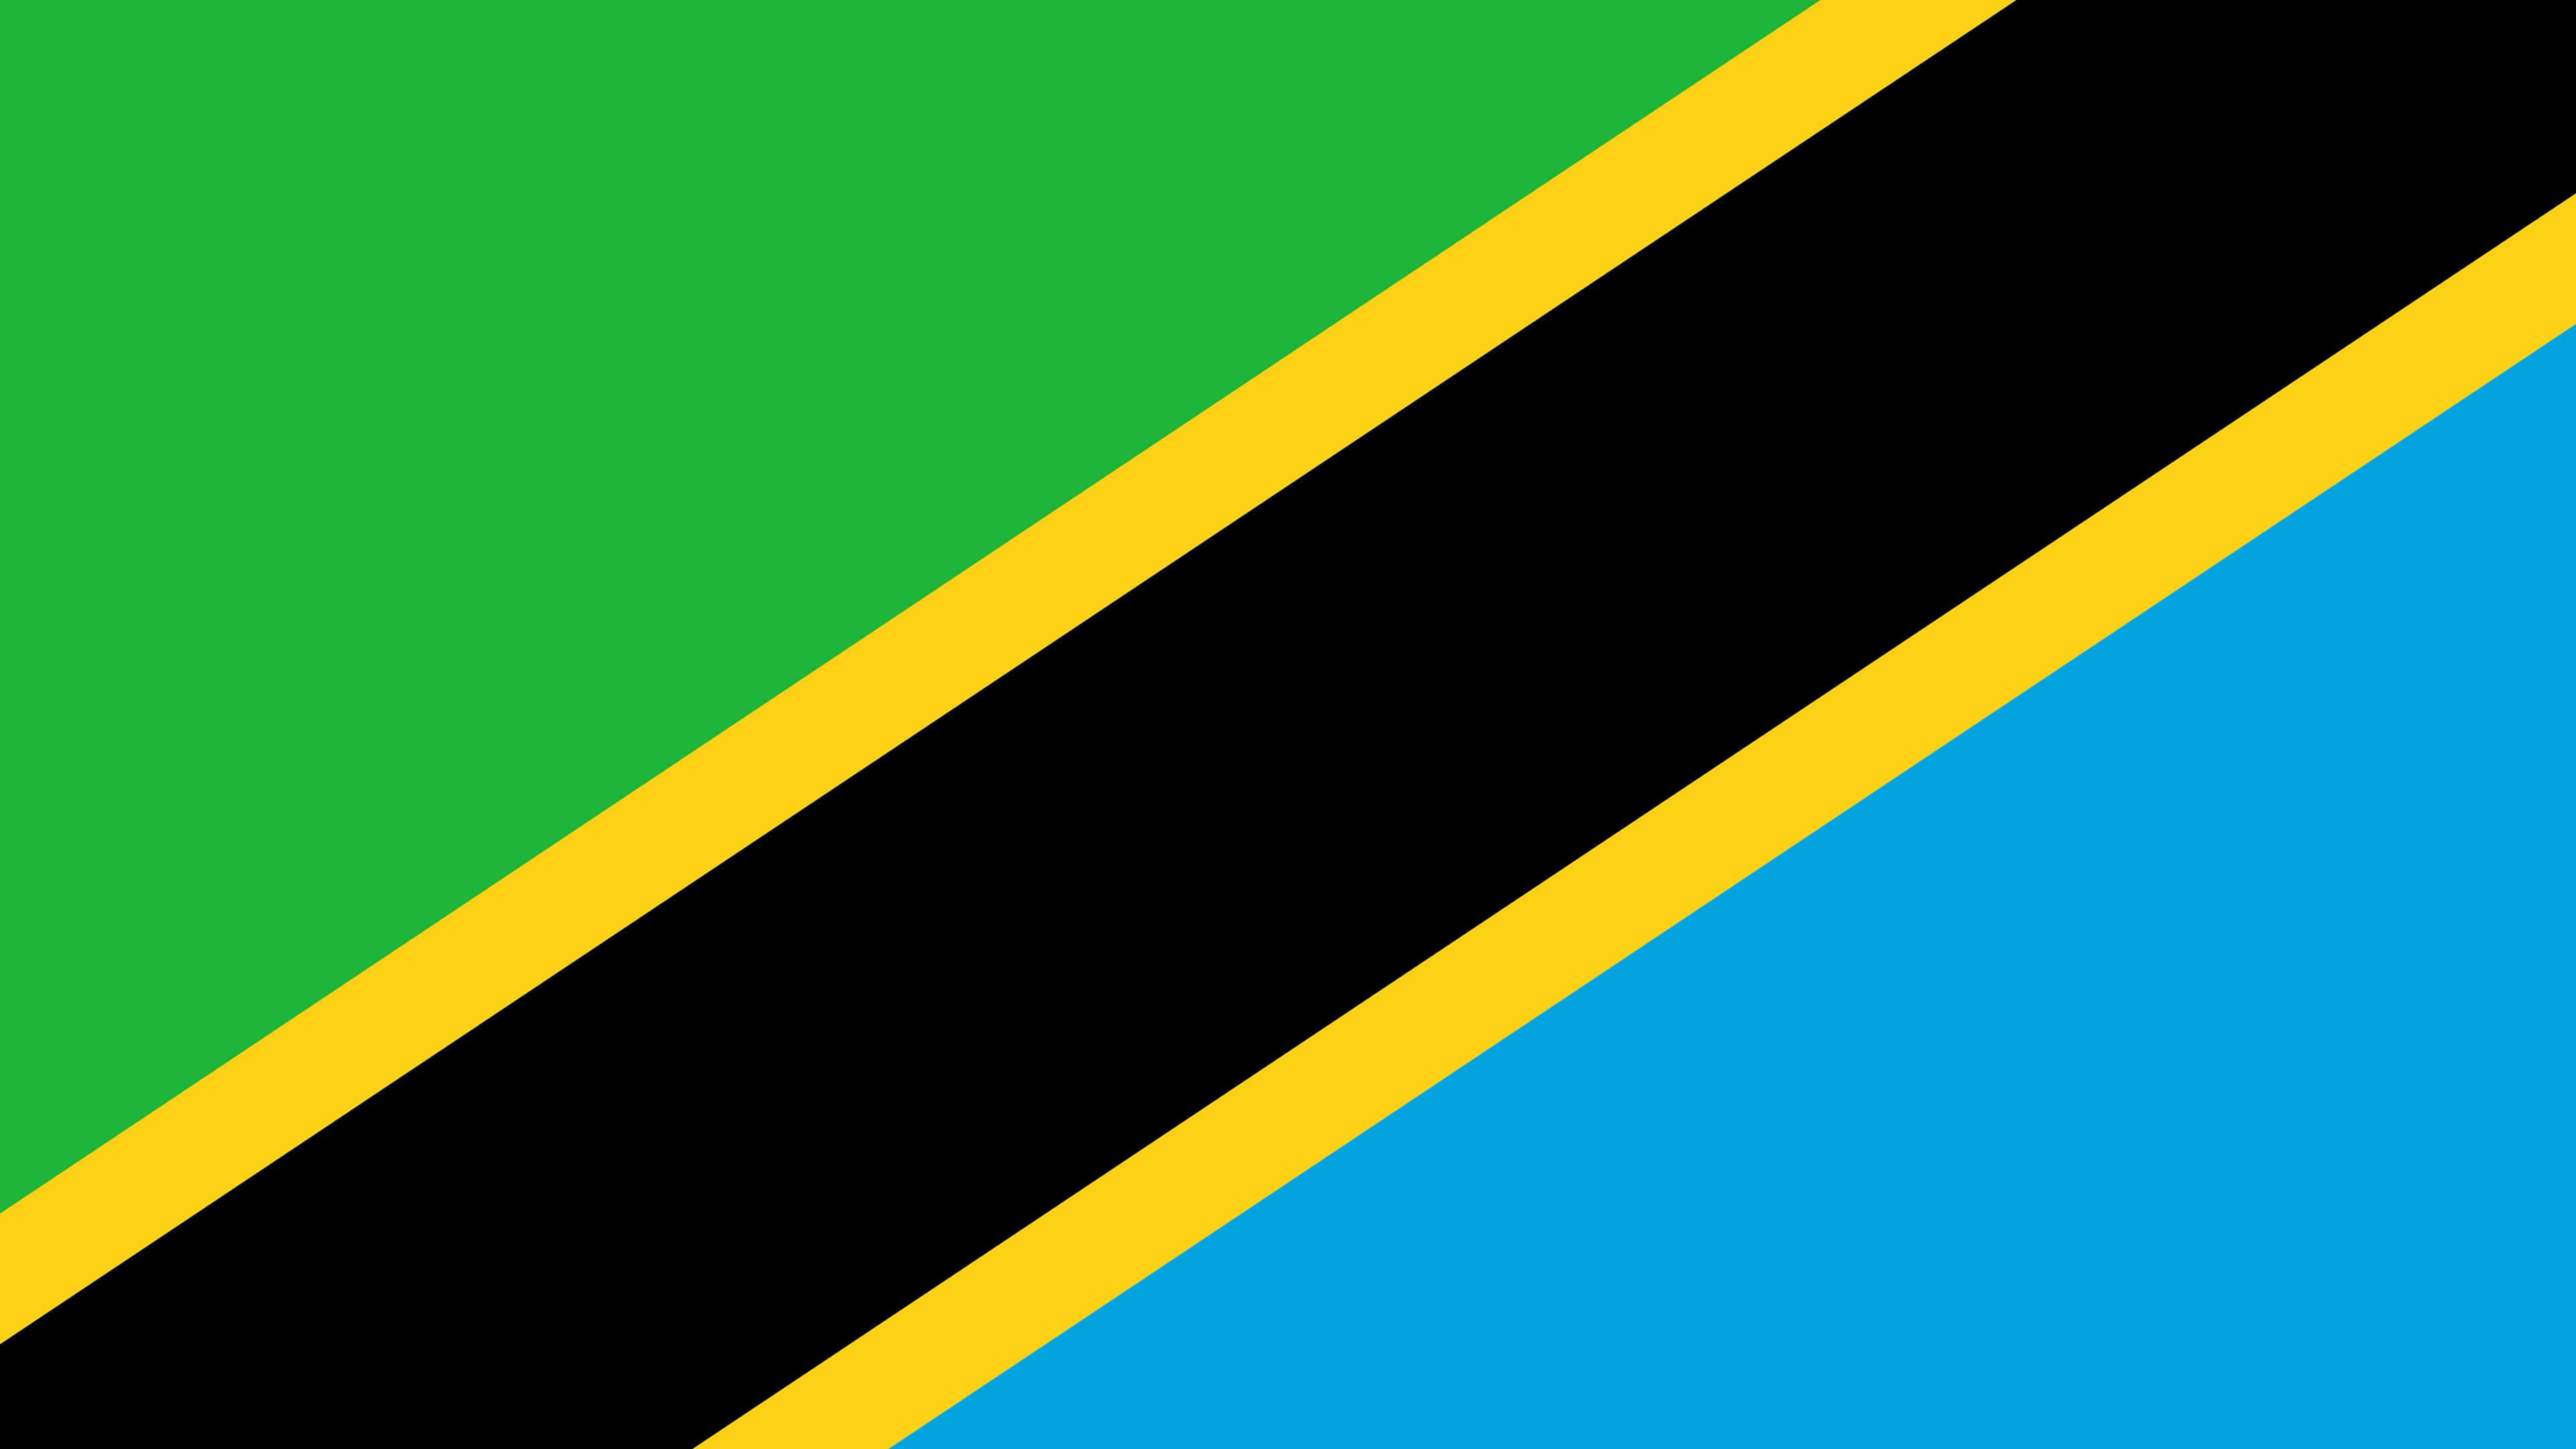 tanzania flag uhd 4k wallpaper